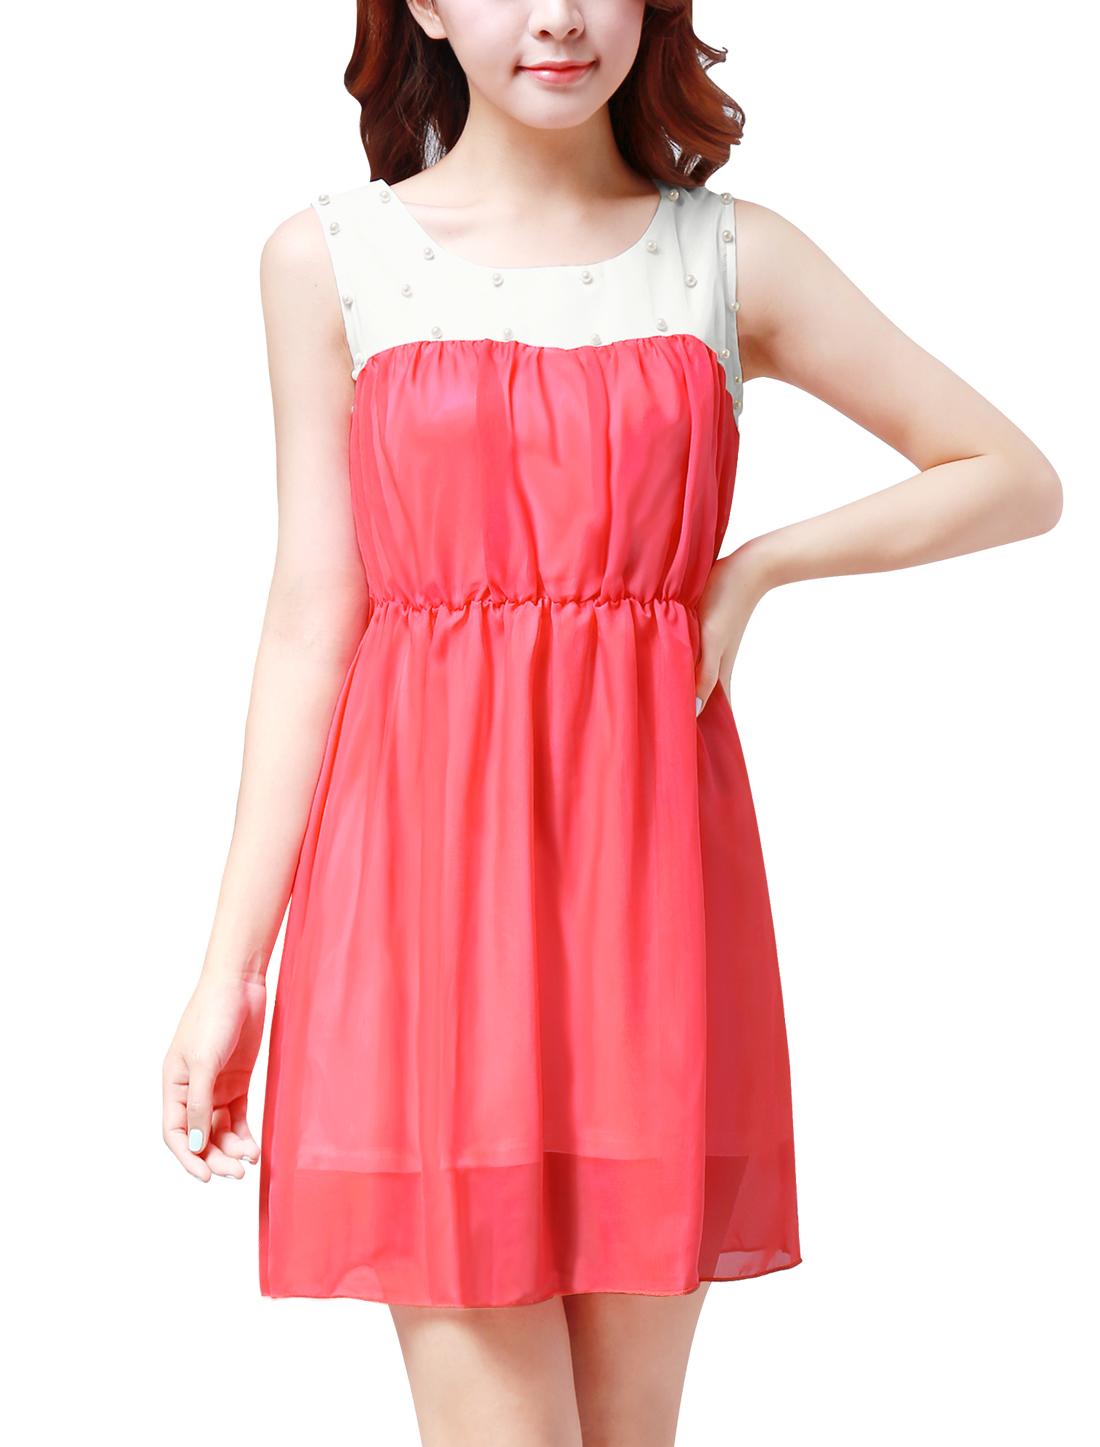 Woman New Fashion Scoop Neck Sleeveless Watermelon Red Mini Dress M